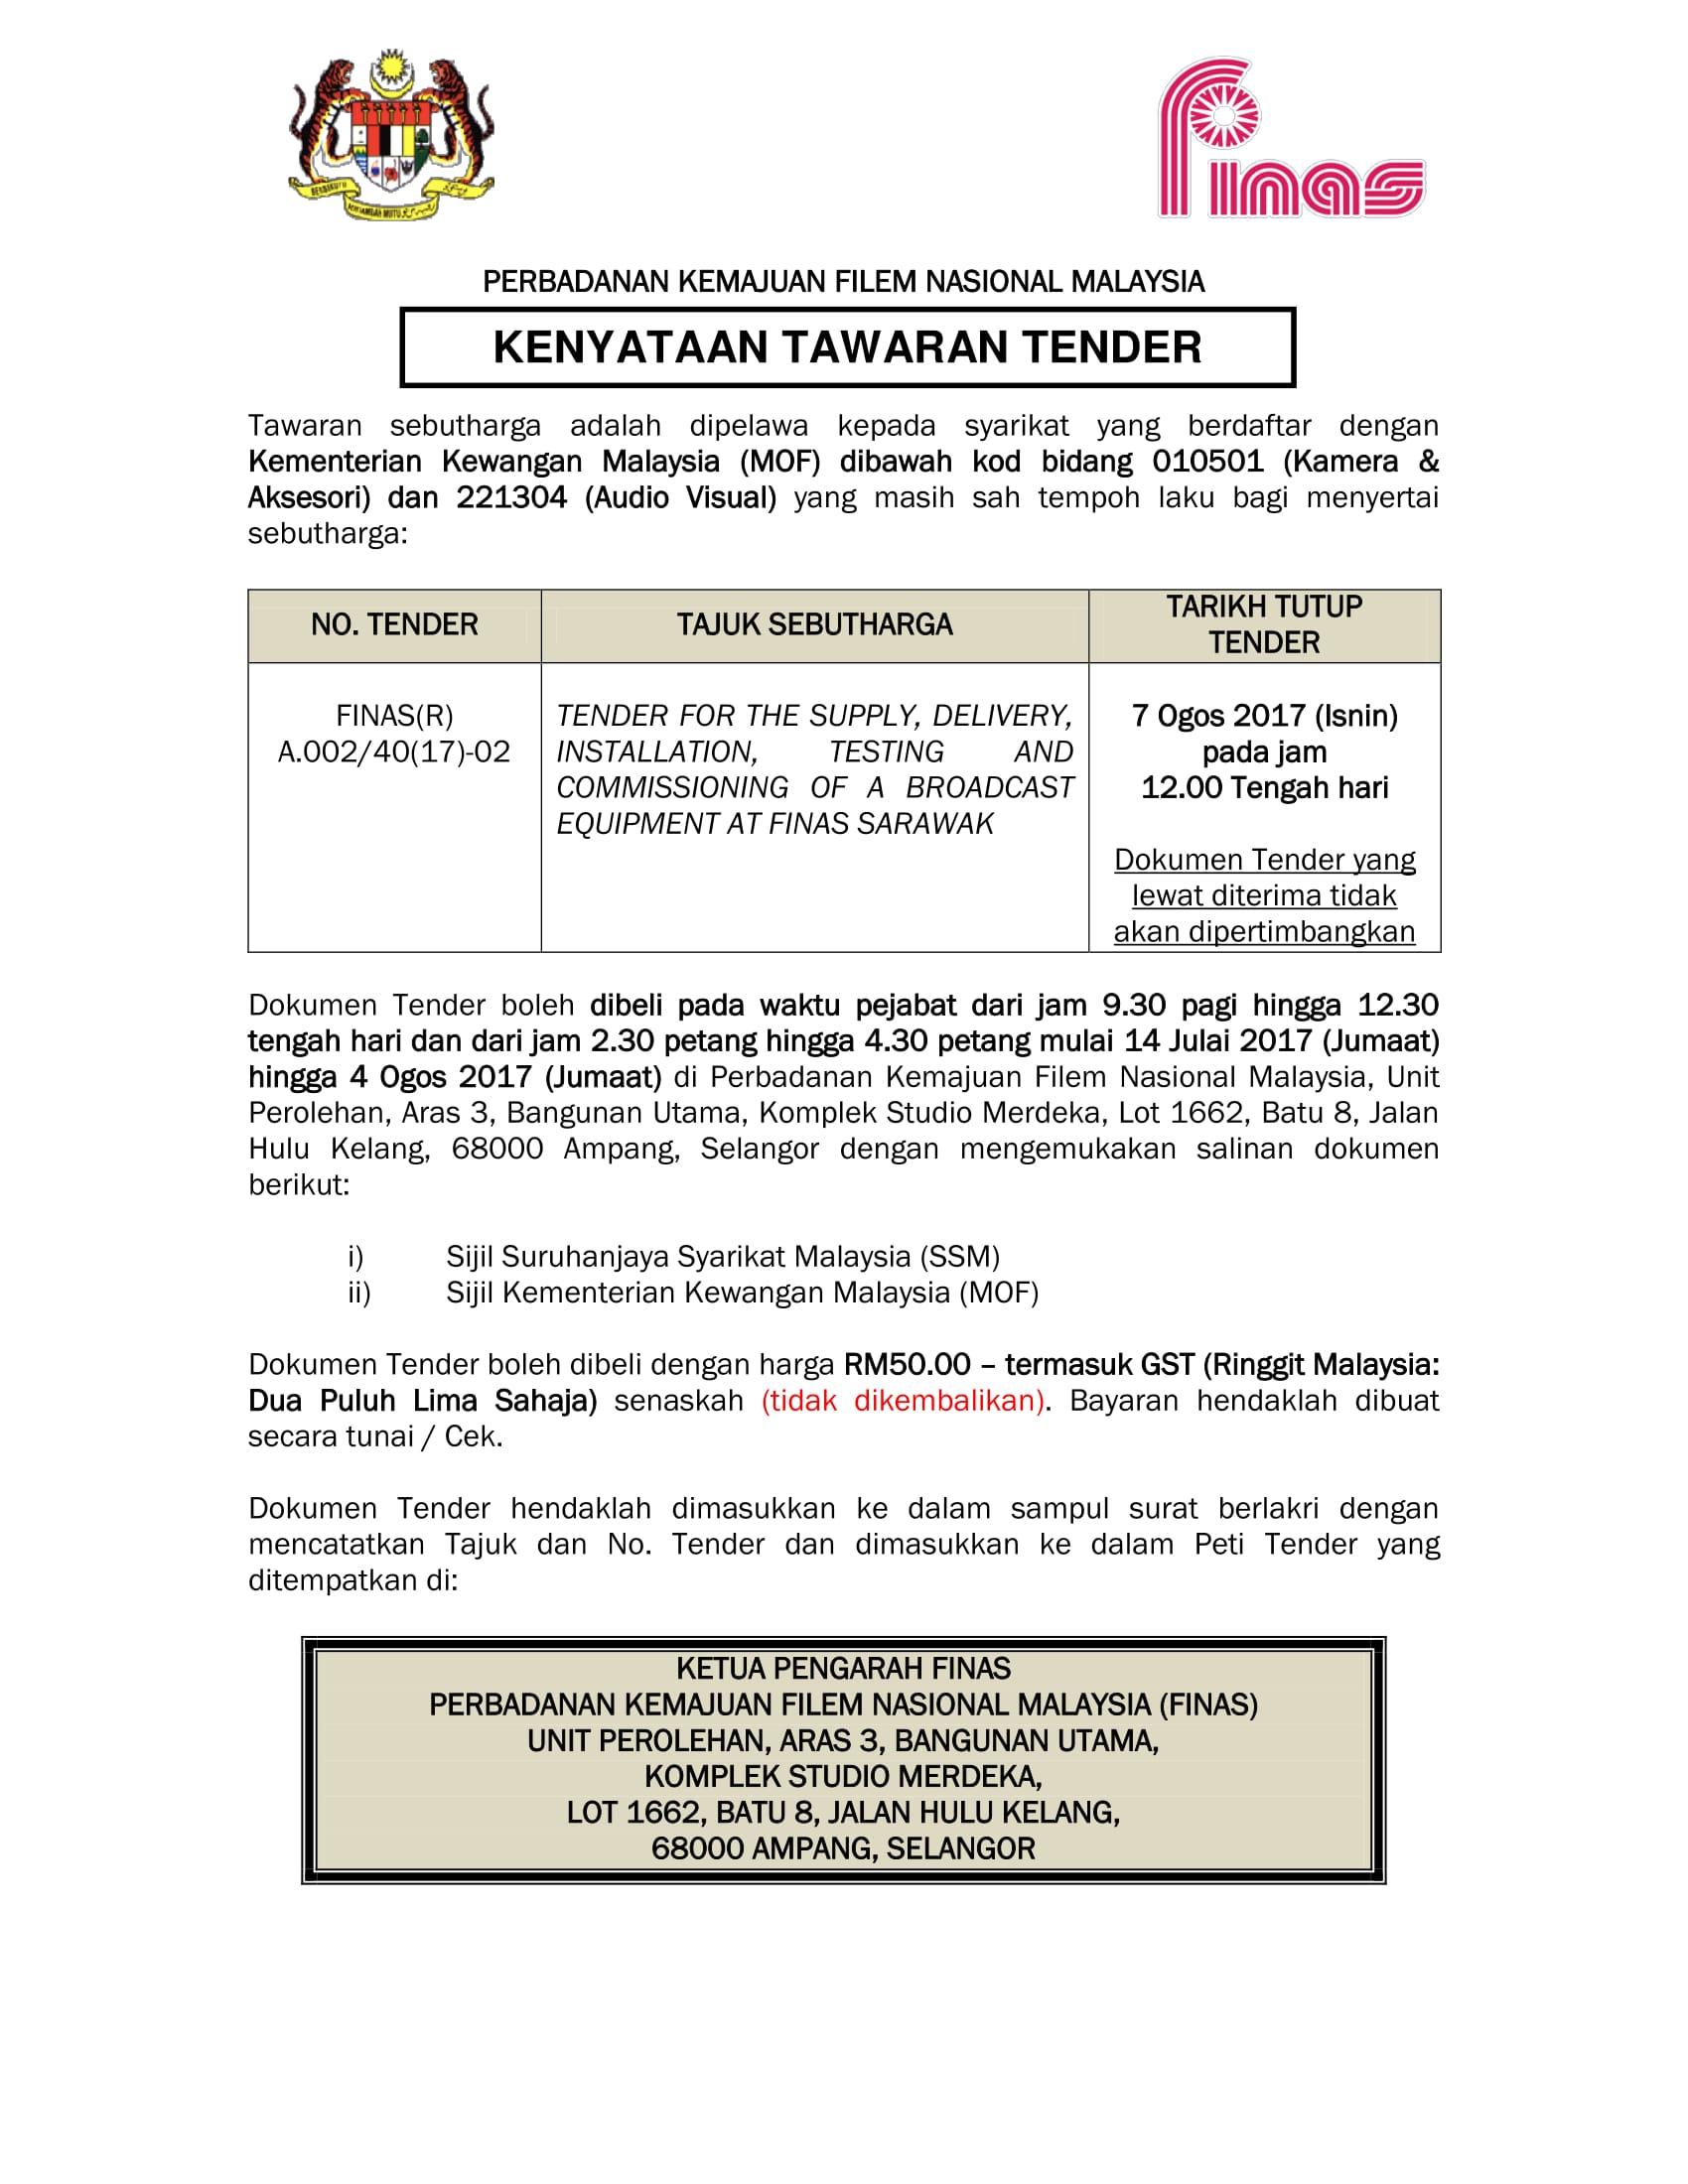 KENYATAAN TAWARAN (11072017-1)-1